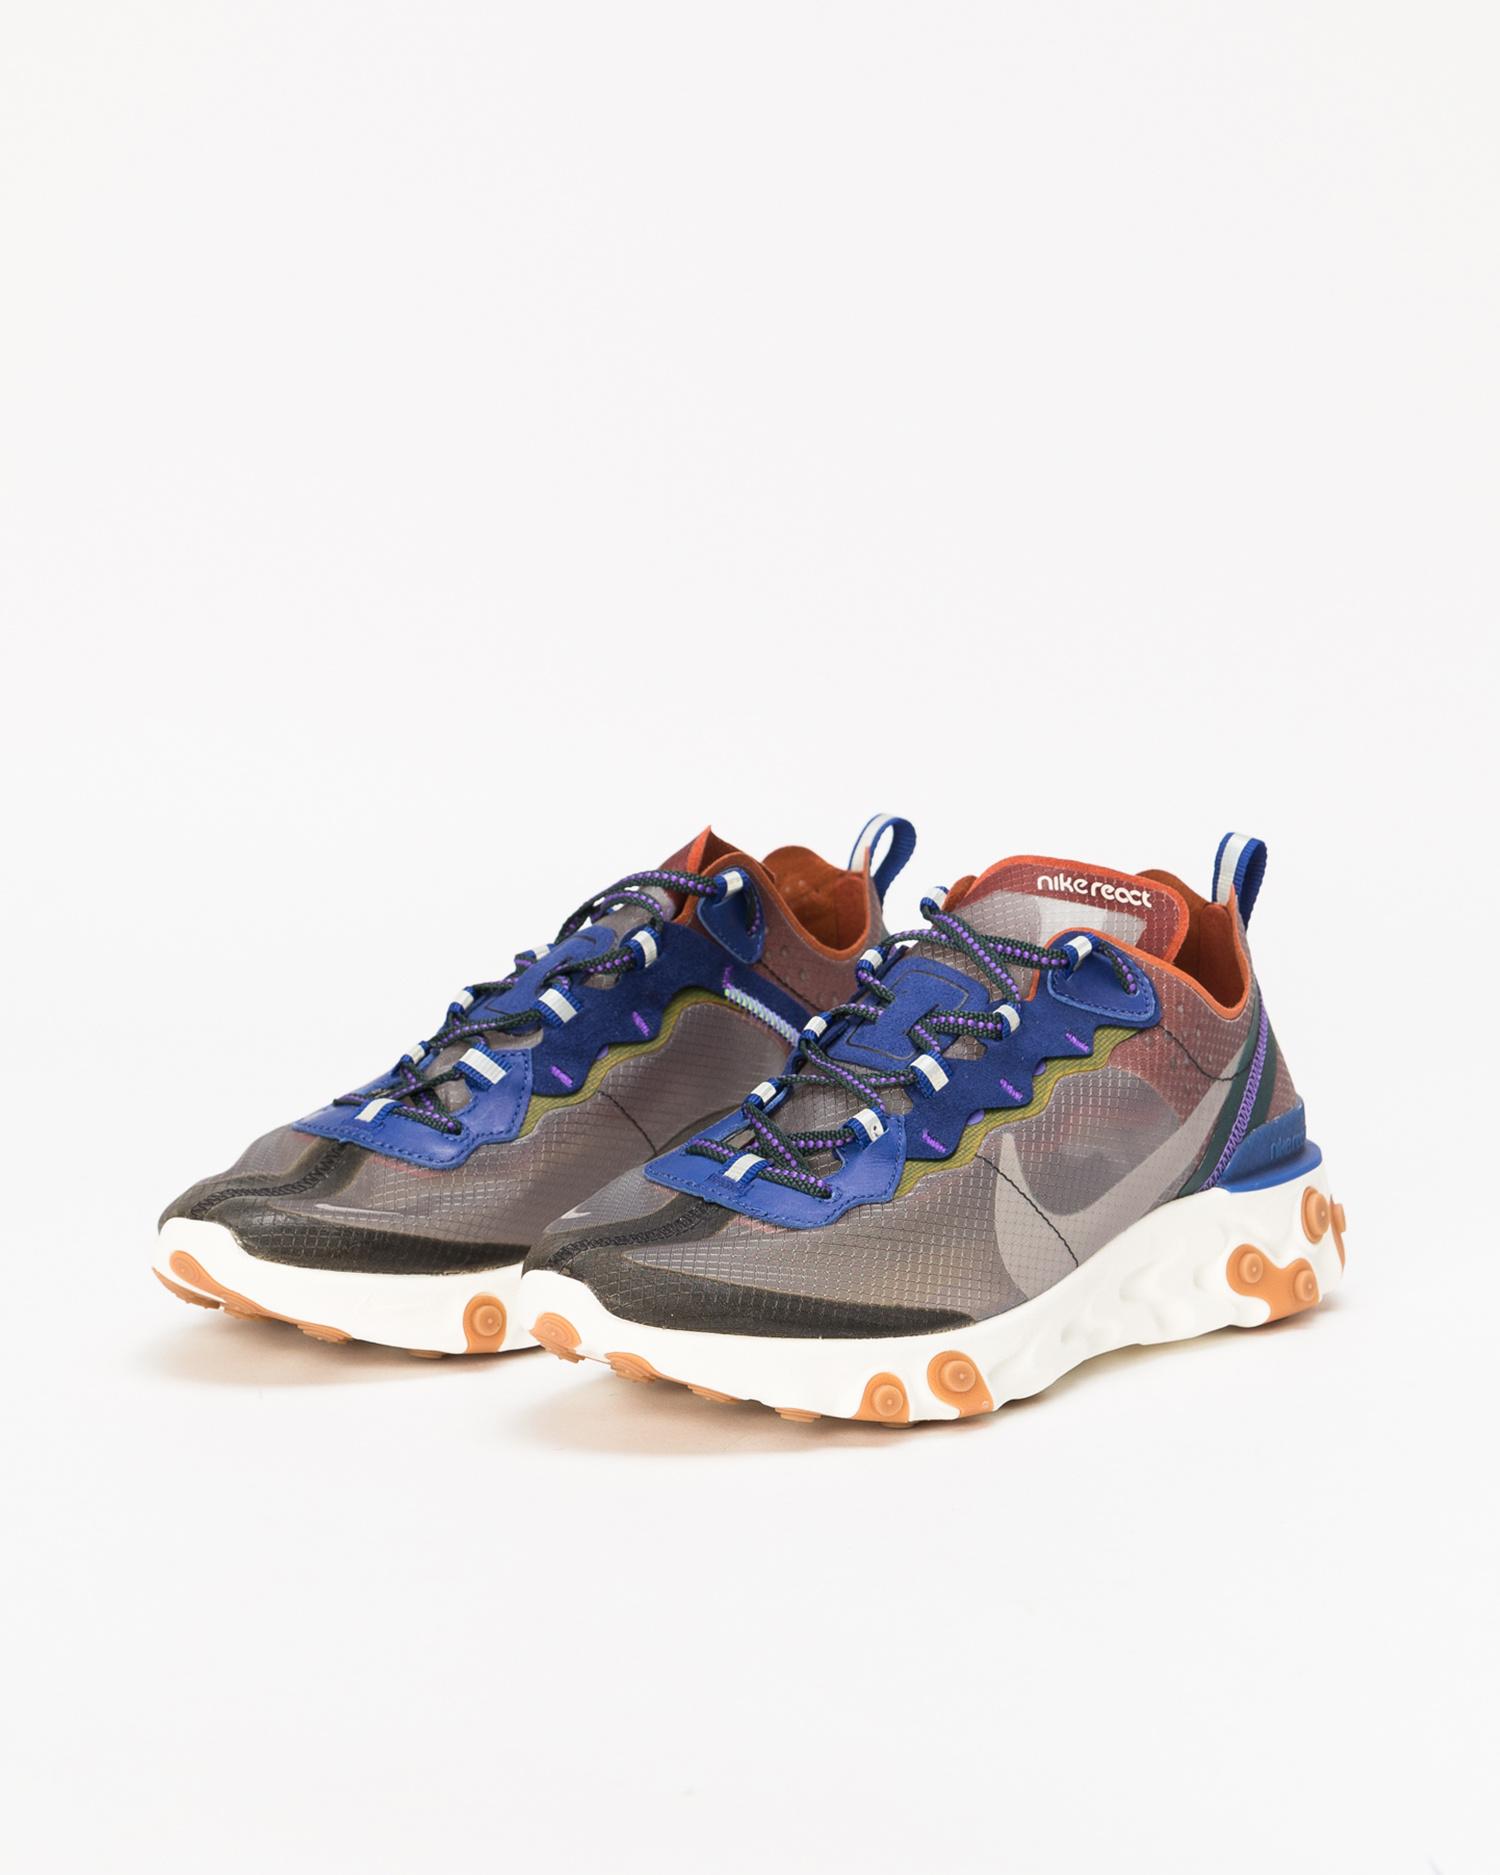 Nike React Element 87 Dusty Peach Atmosphere Grey